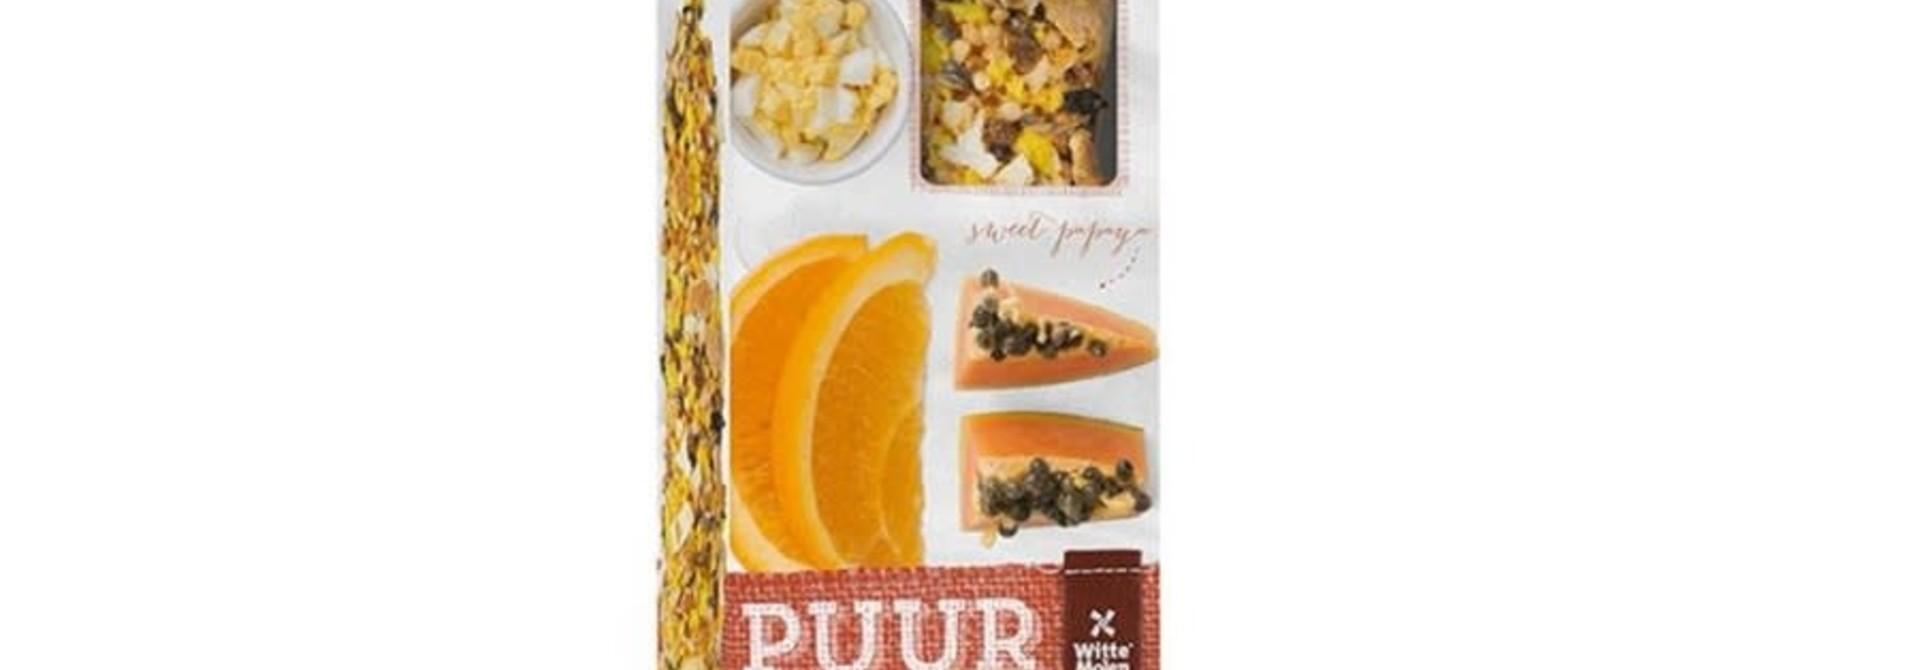 Budgie - Papaya/Orange Treat Sticks